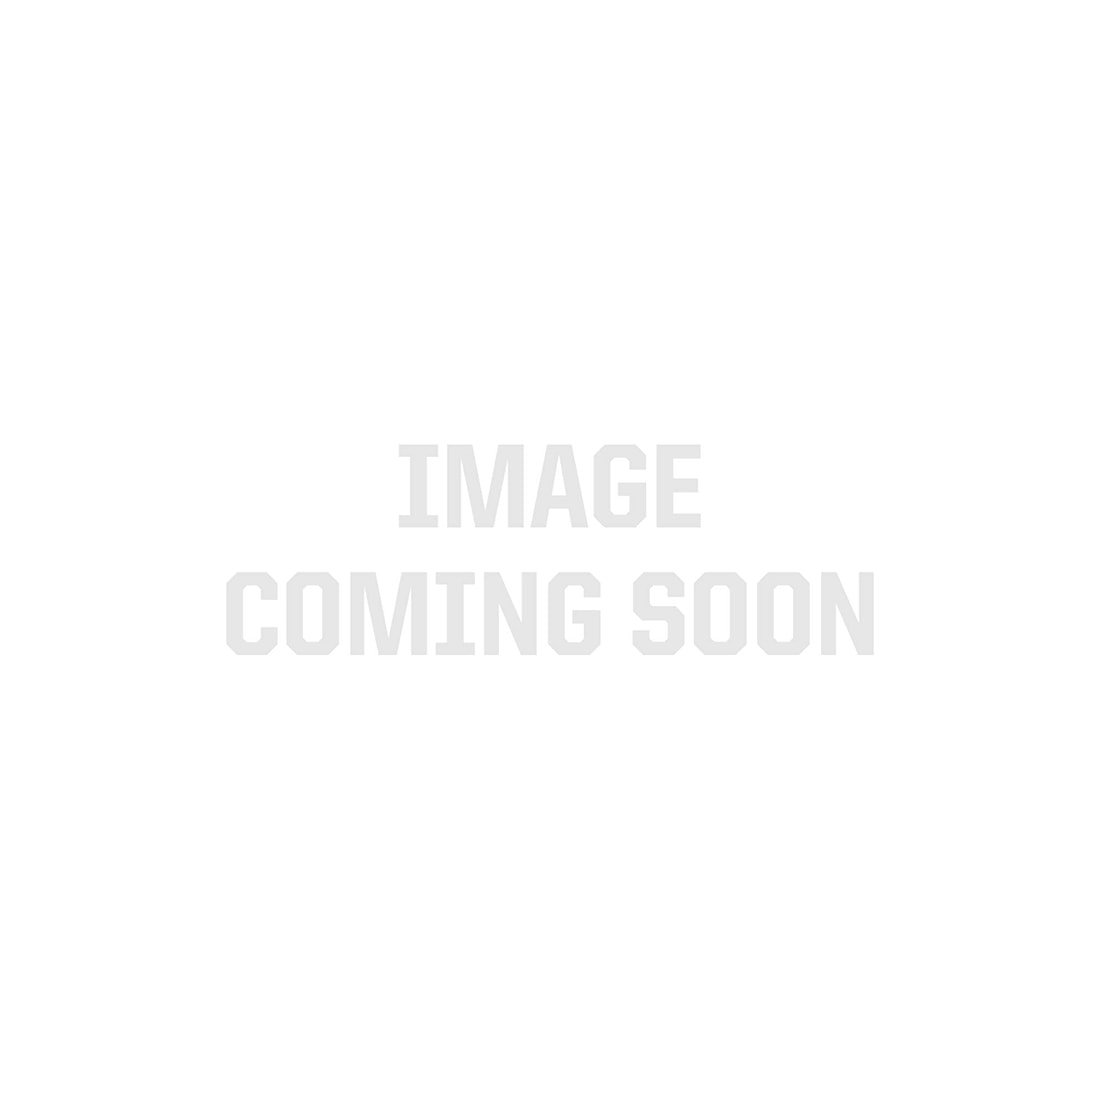 Lutron Rmjs 8t Dv B Powpak Dimming Module With 0 10 V